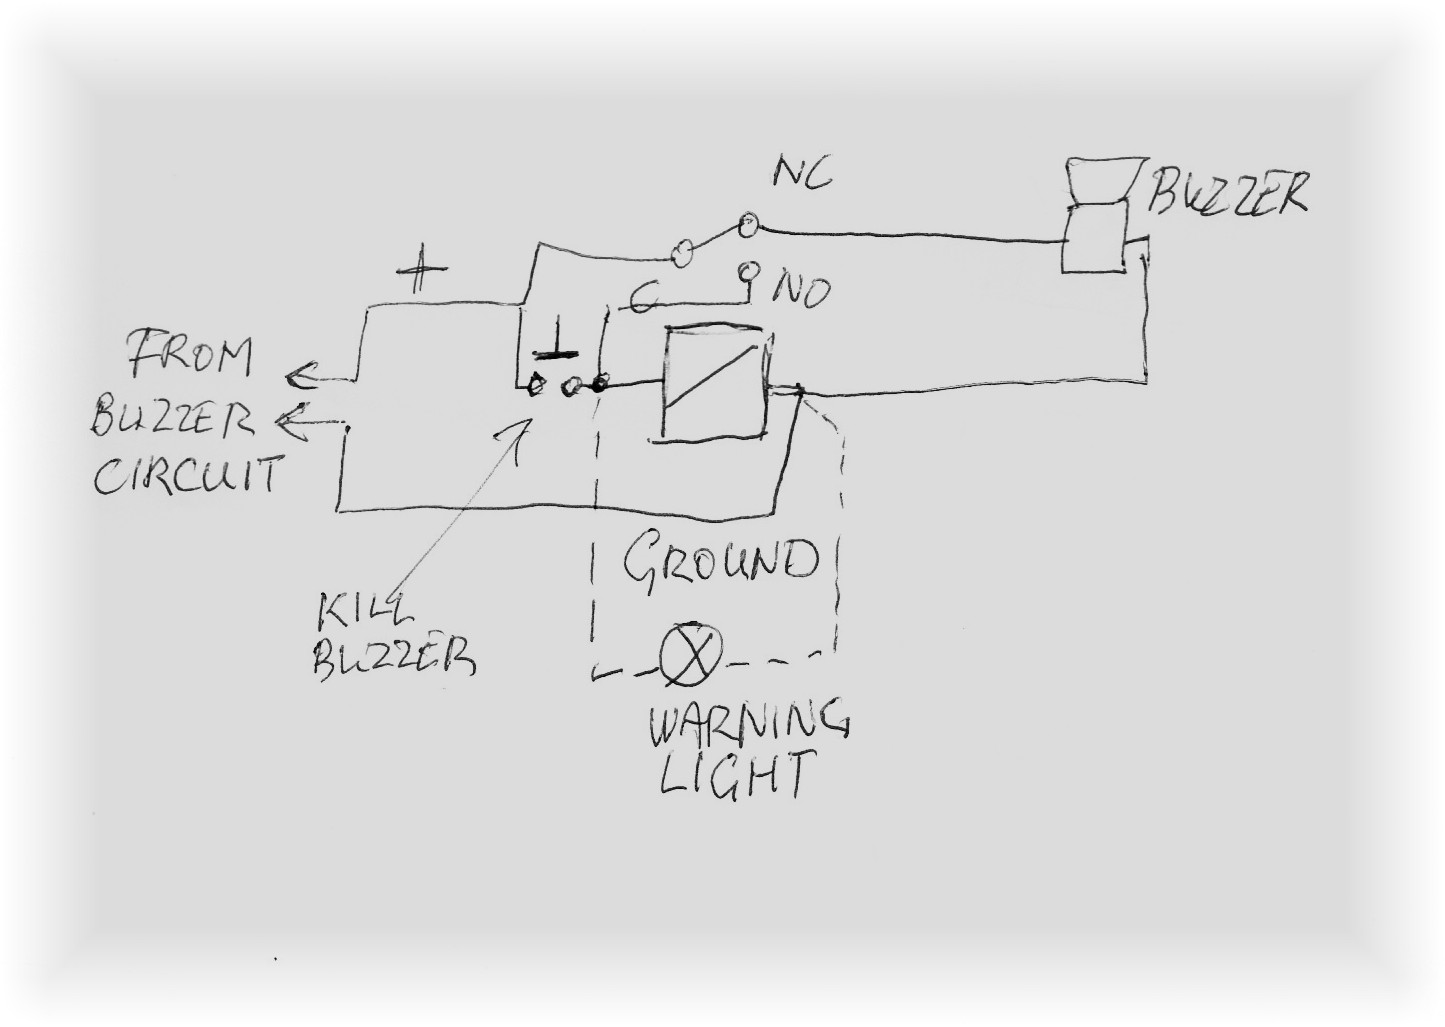 dump body alarm wiring diagram